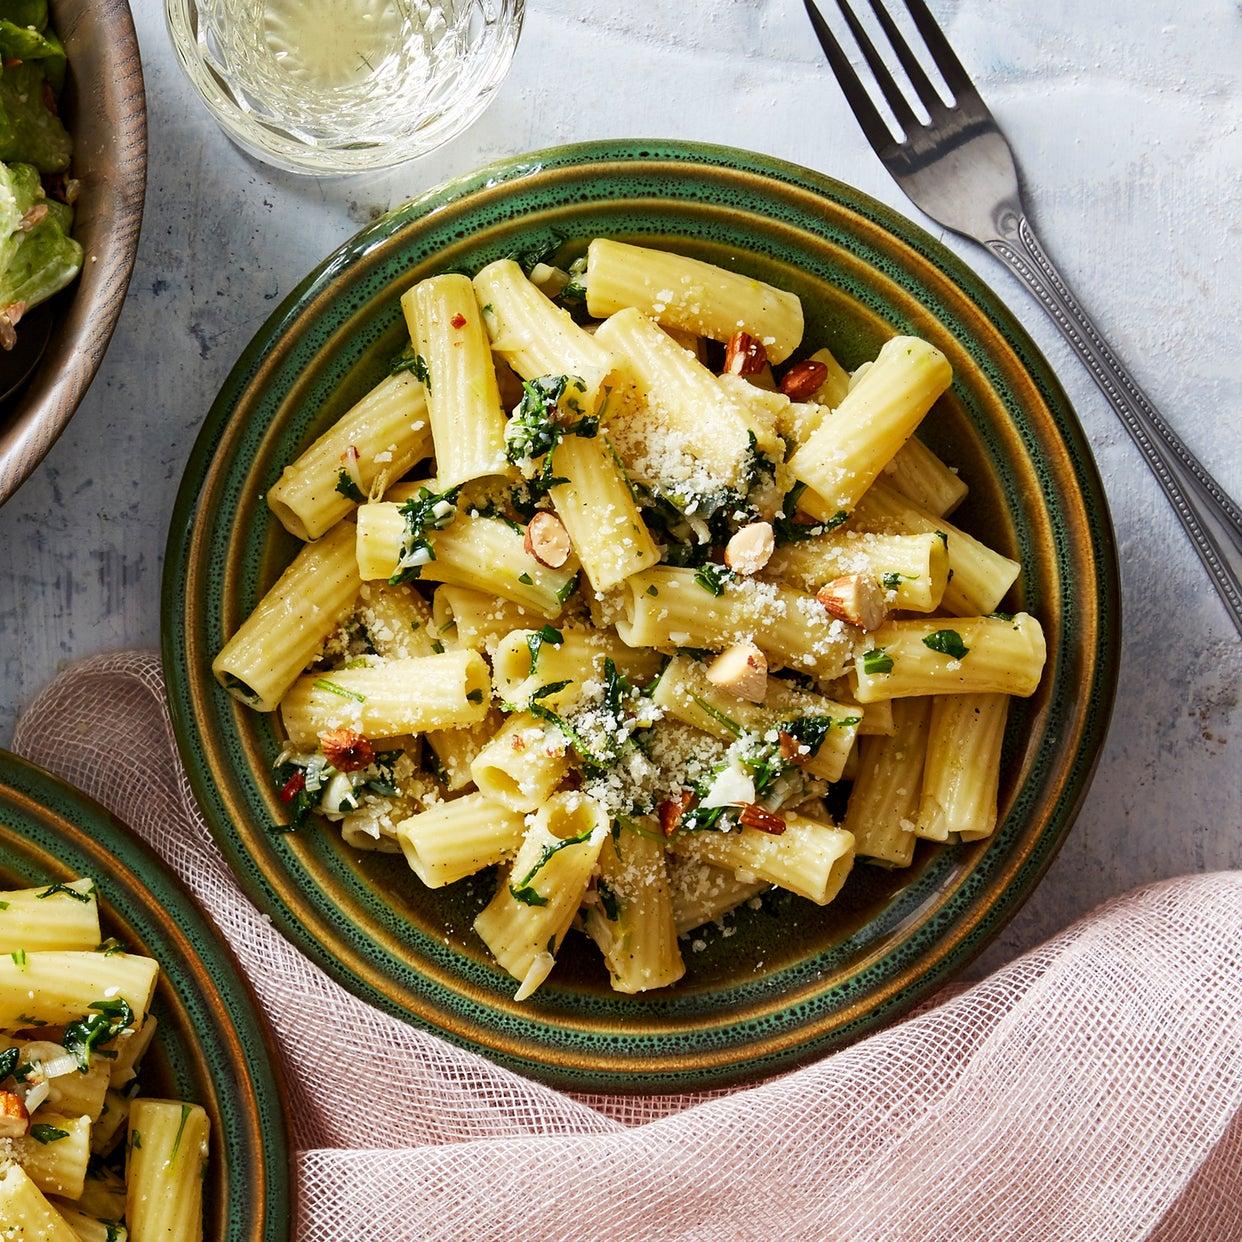 Green Garlic Pesto Pasta with Butter Lettuce Salad & Creamy Lemon Dressing